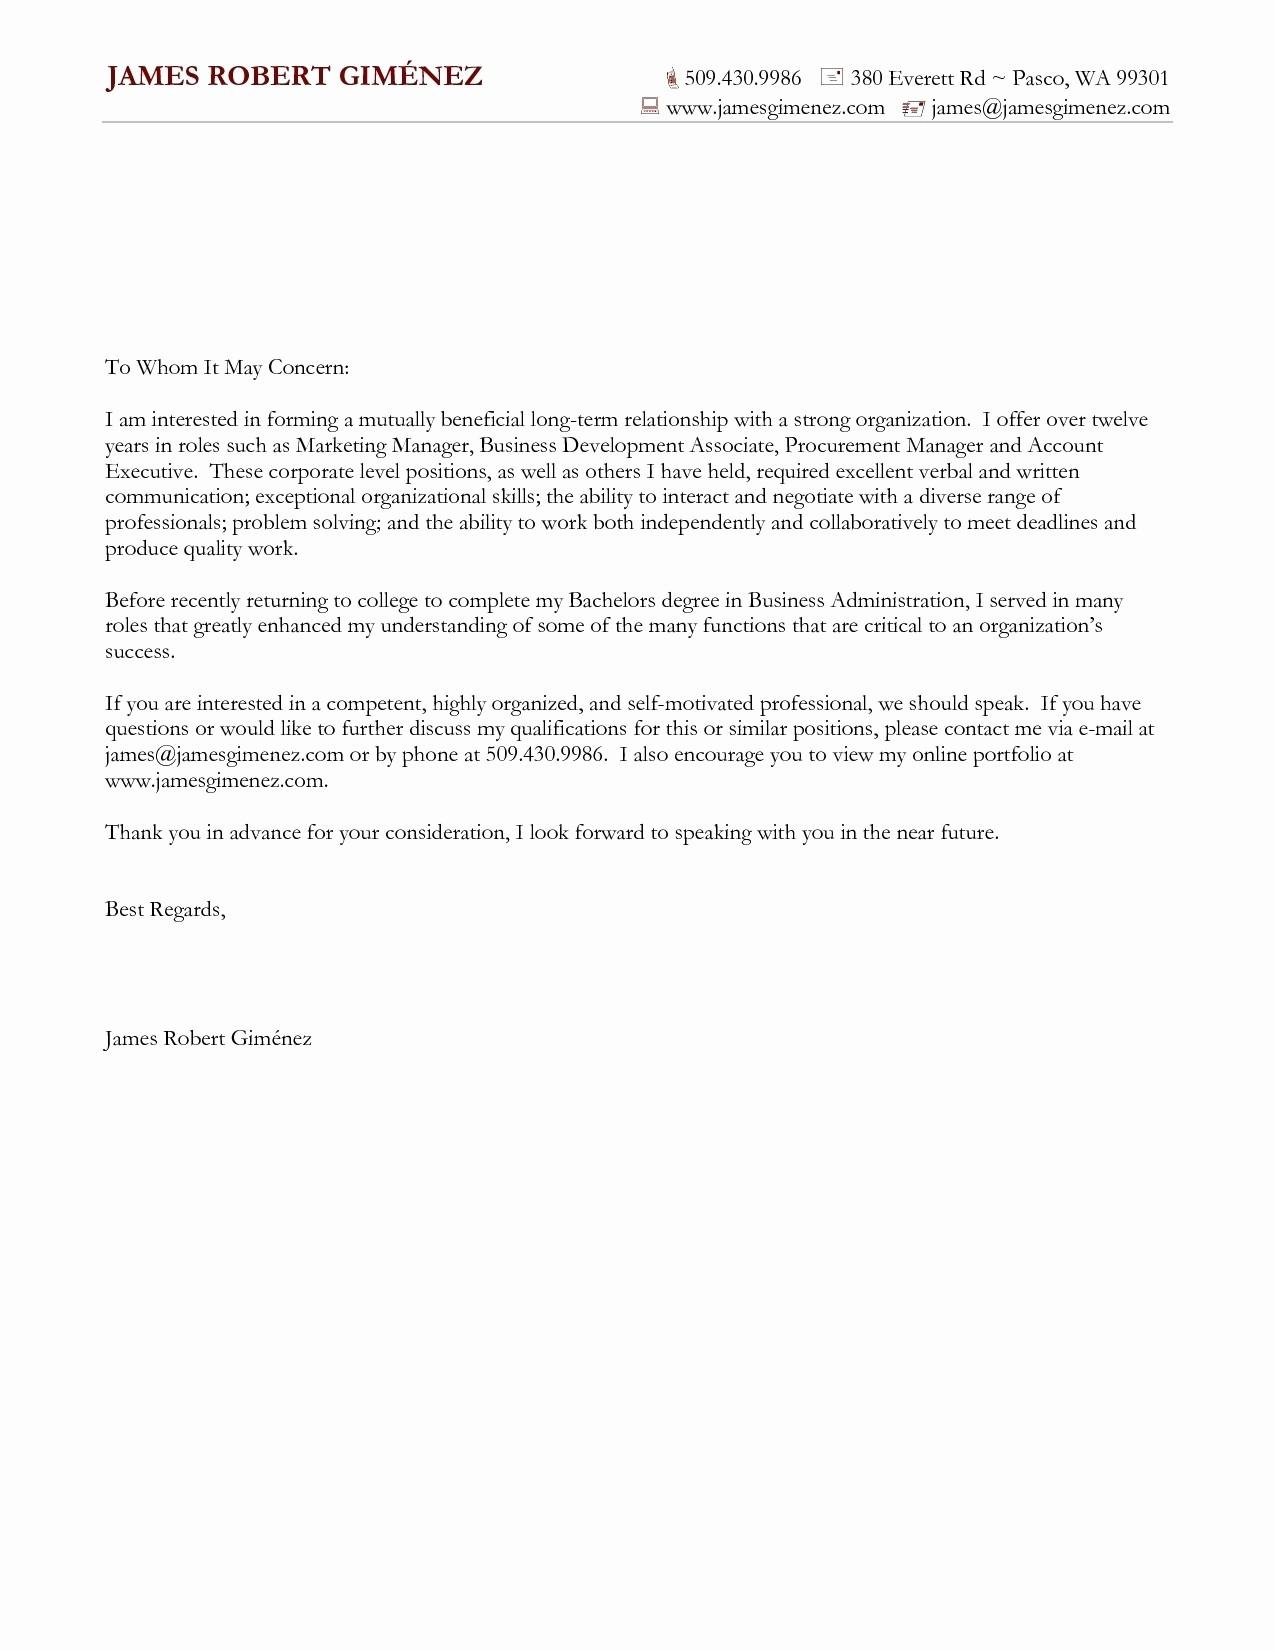 Sample Resume and Cover Letter Best Of Mock Cover Letter